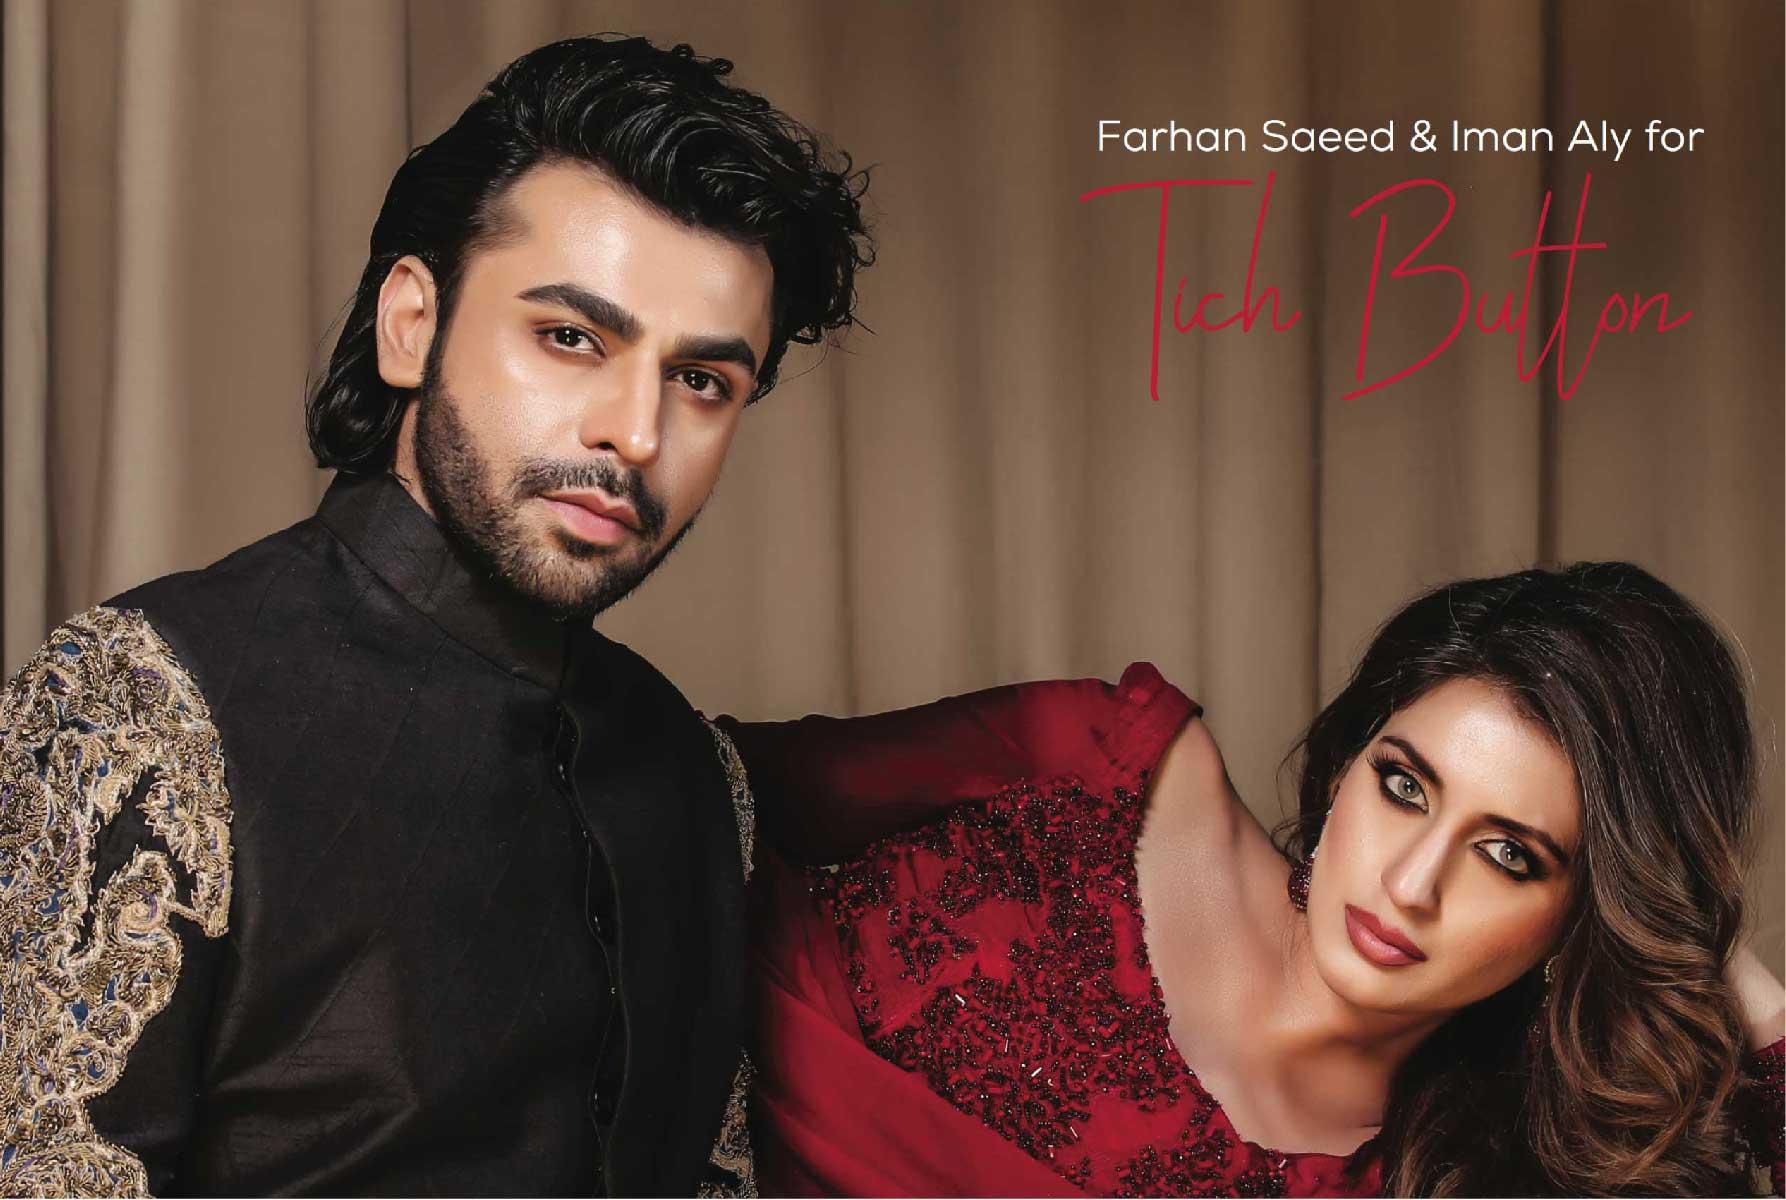 DBS_Farhan_Saeed_and_Iman_Ali_For_Tich_button